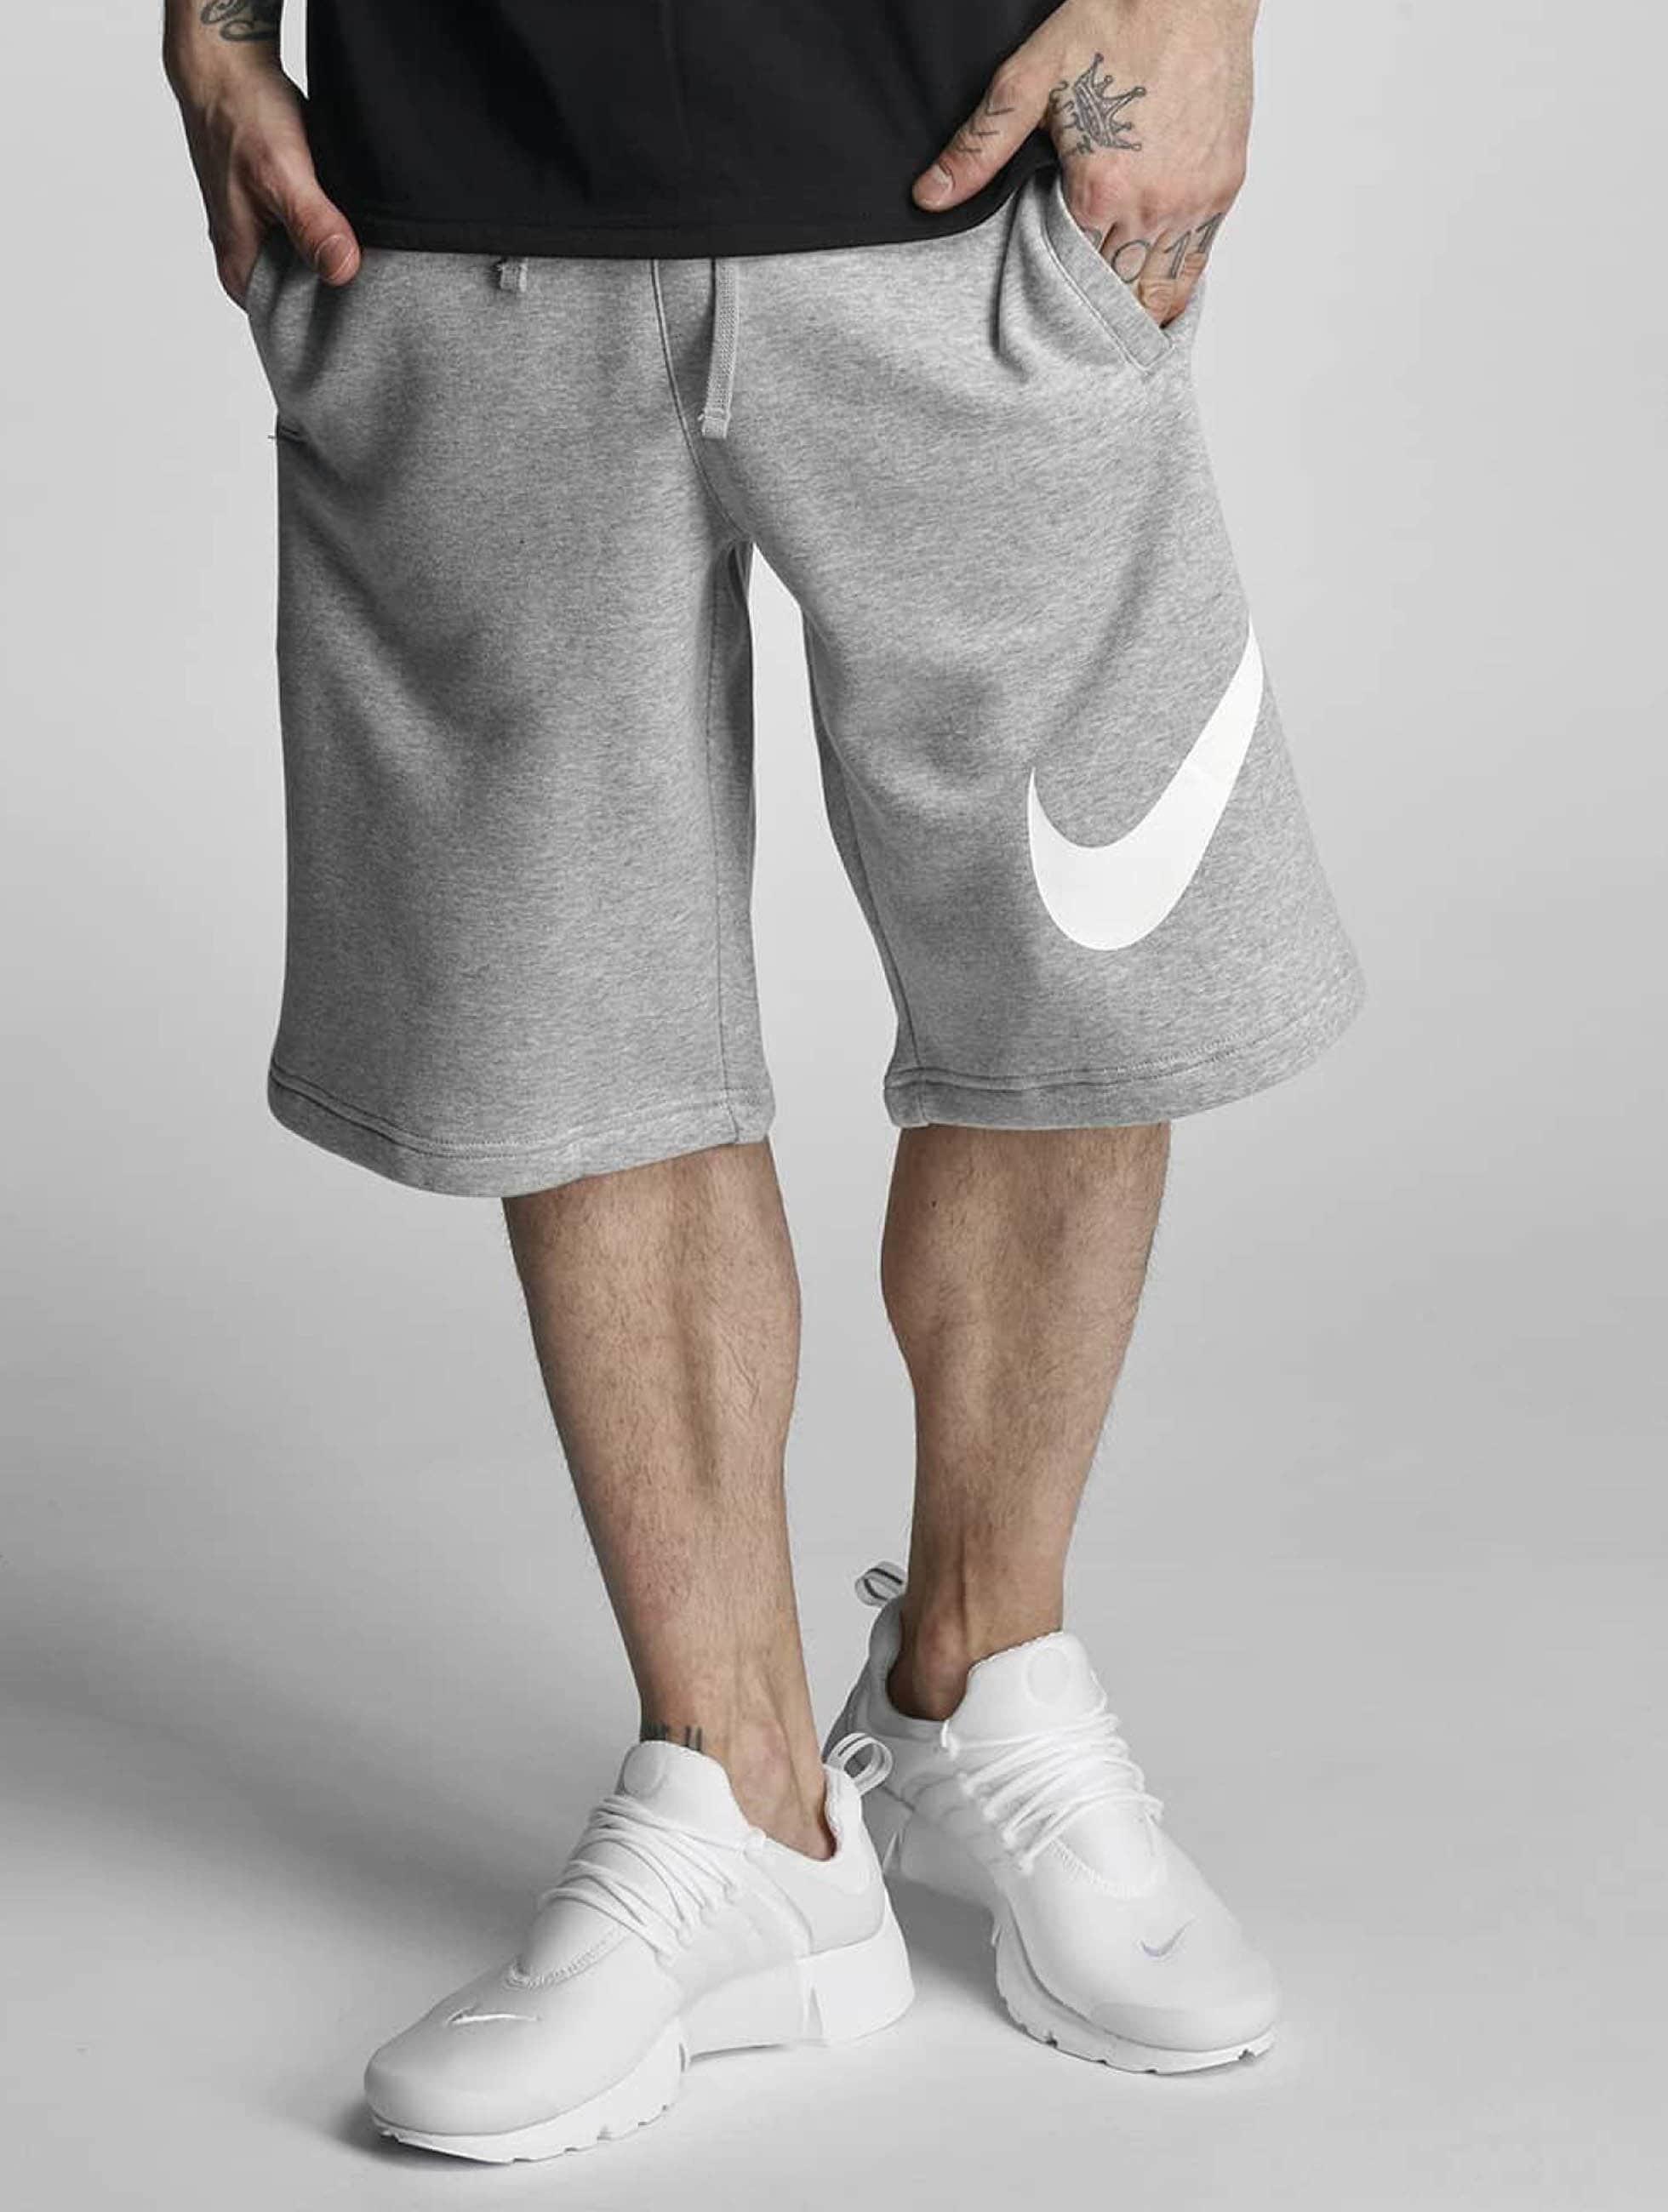 Nike Männer Shorts FLC EXP Club in grau